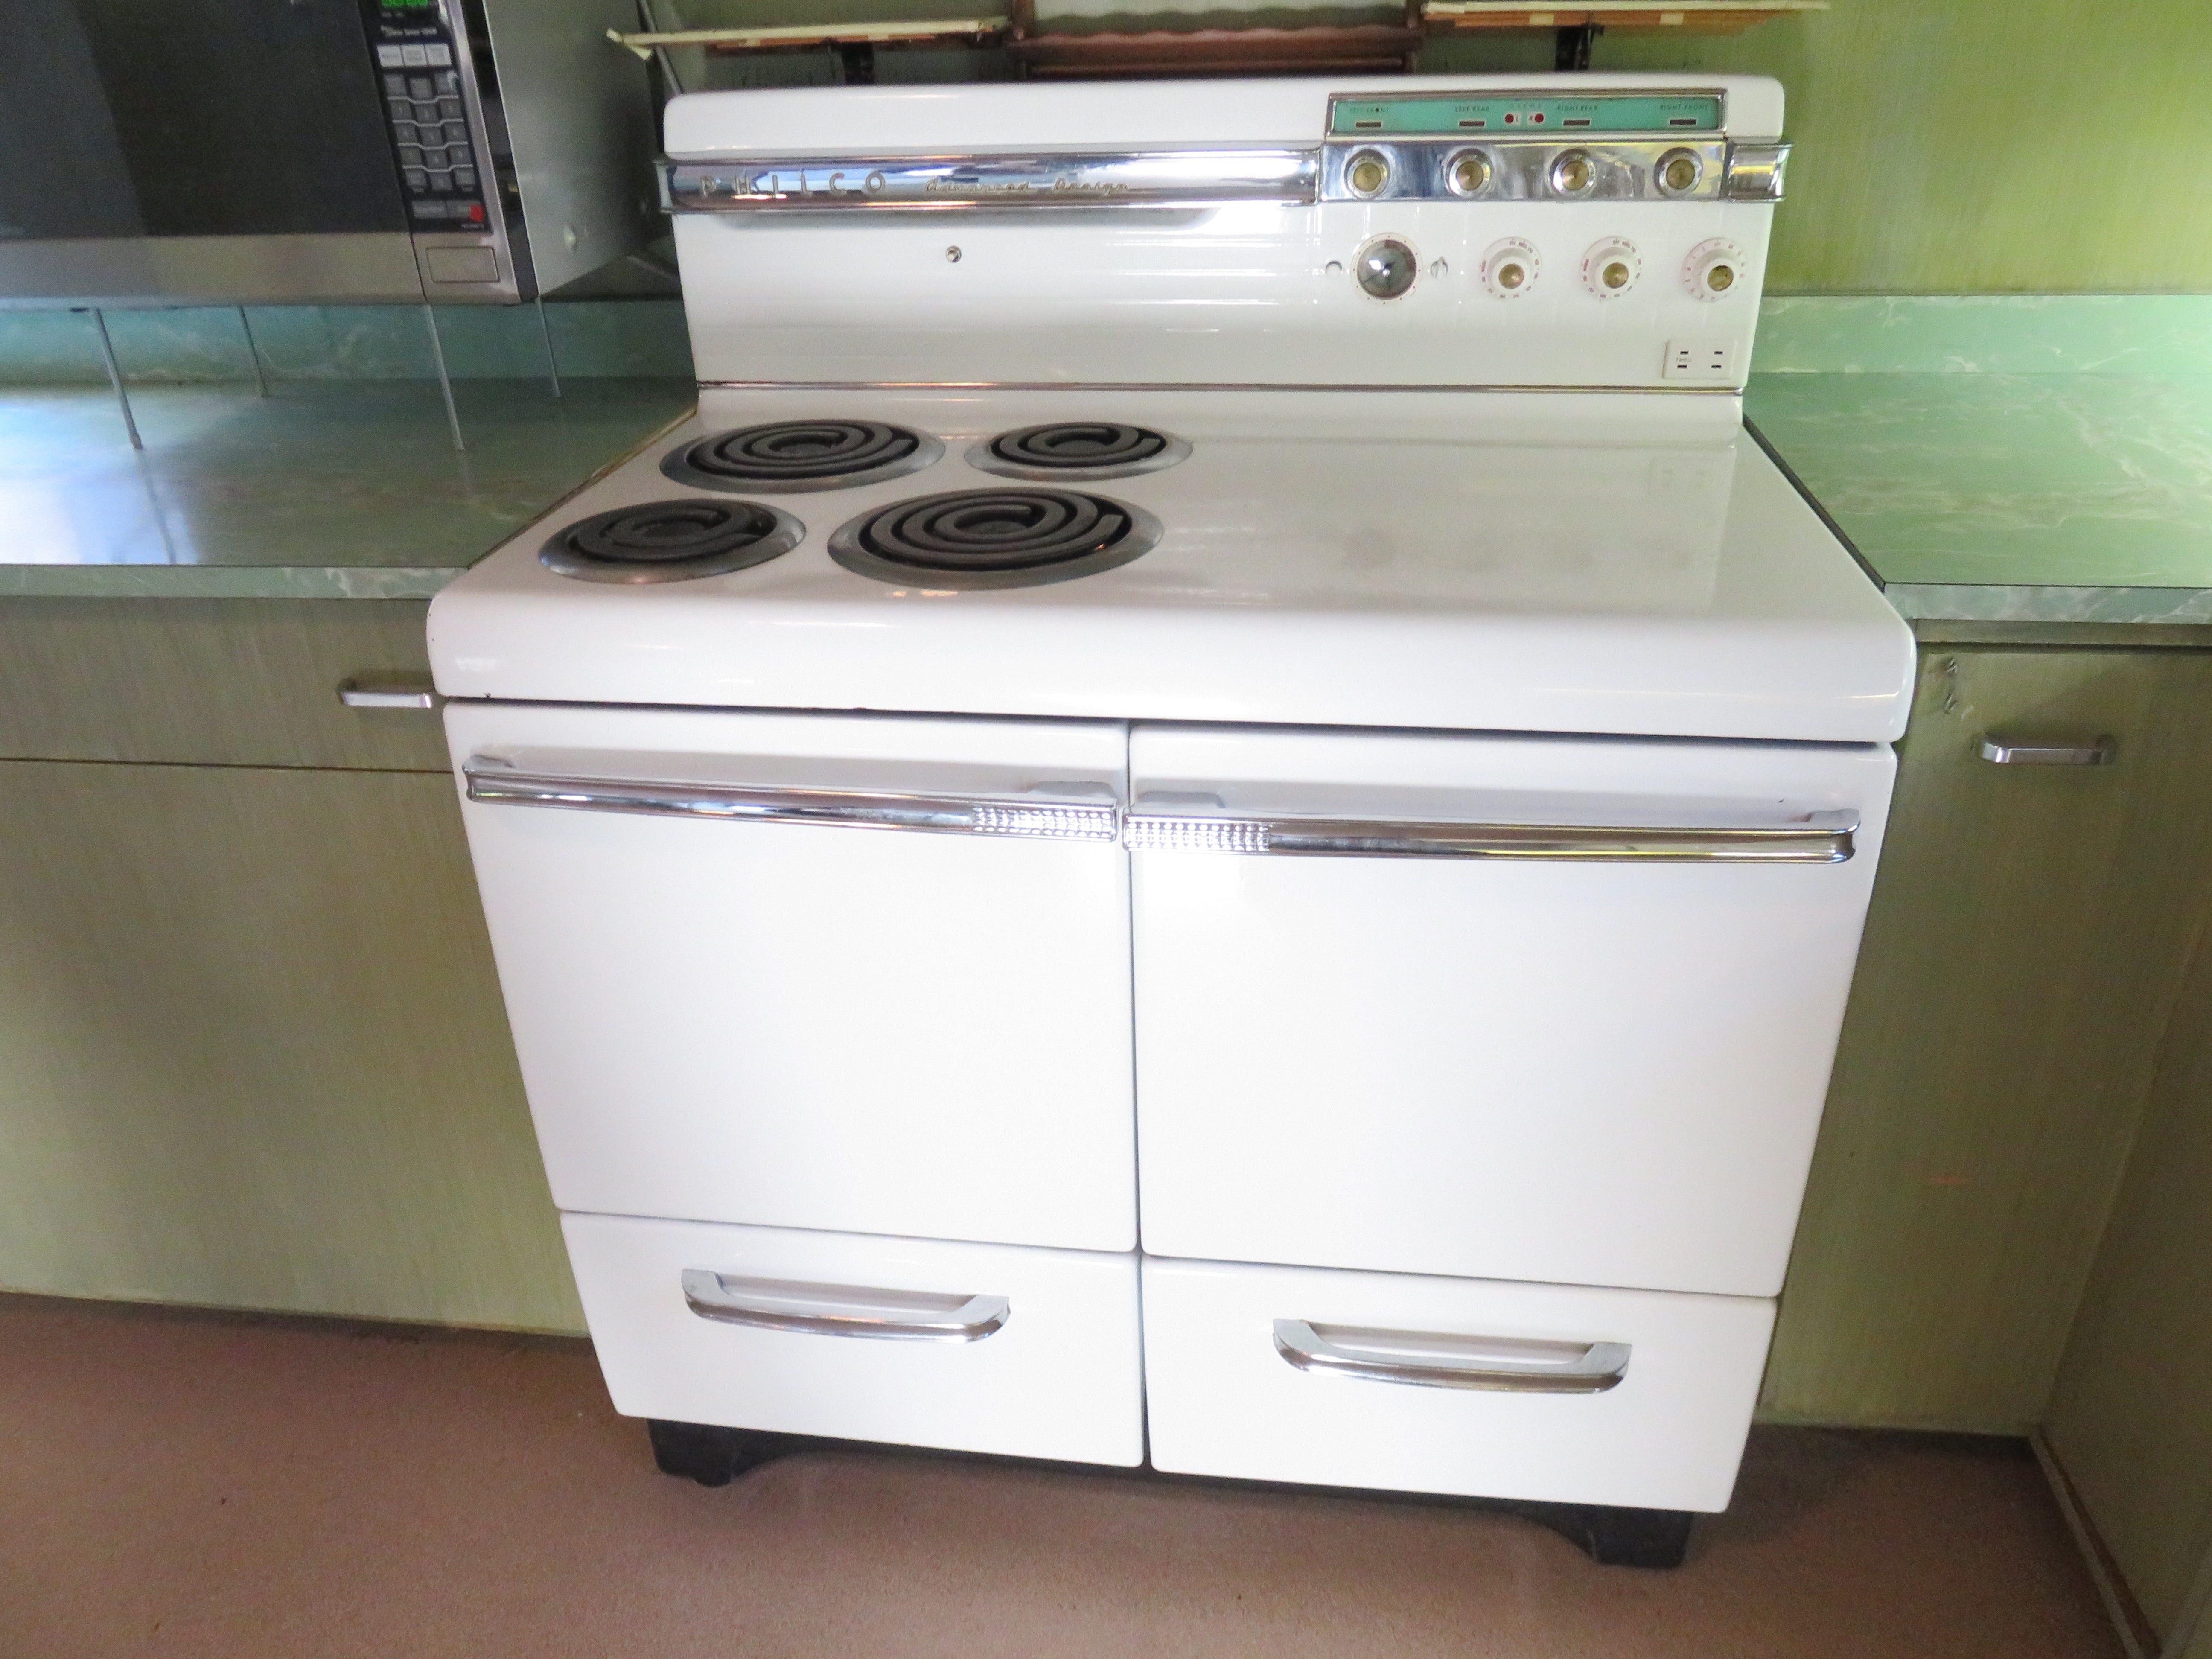 The Philco stove in kitchen still works.